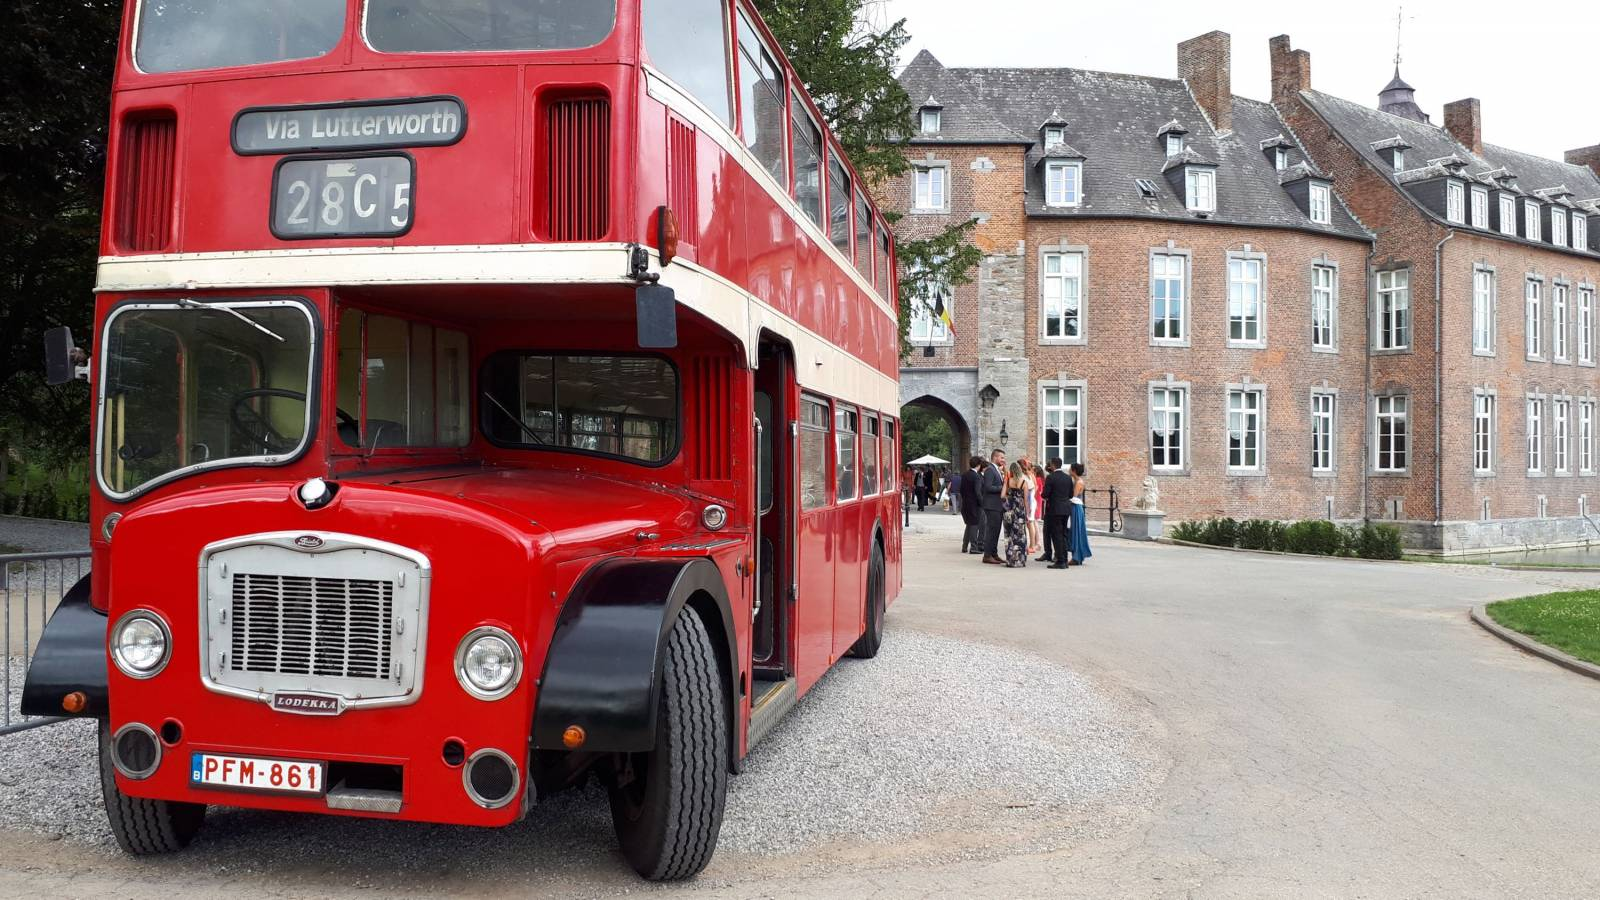 The London Ceremony Bus - Trouwvervoer - Ceremonievervoer - Bus - House of Weddings - 18